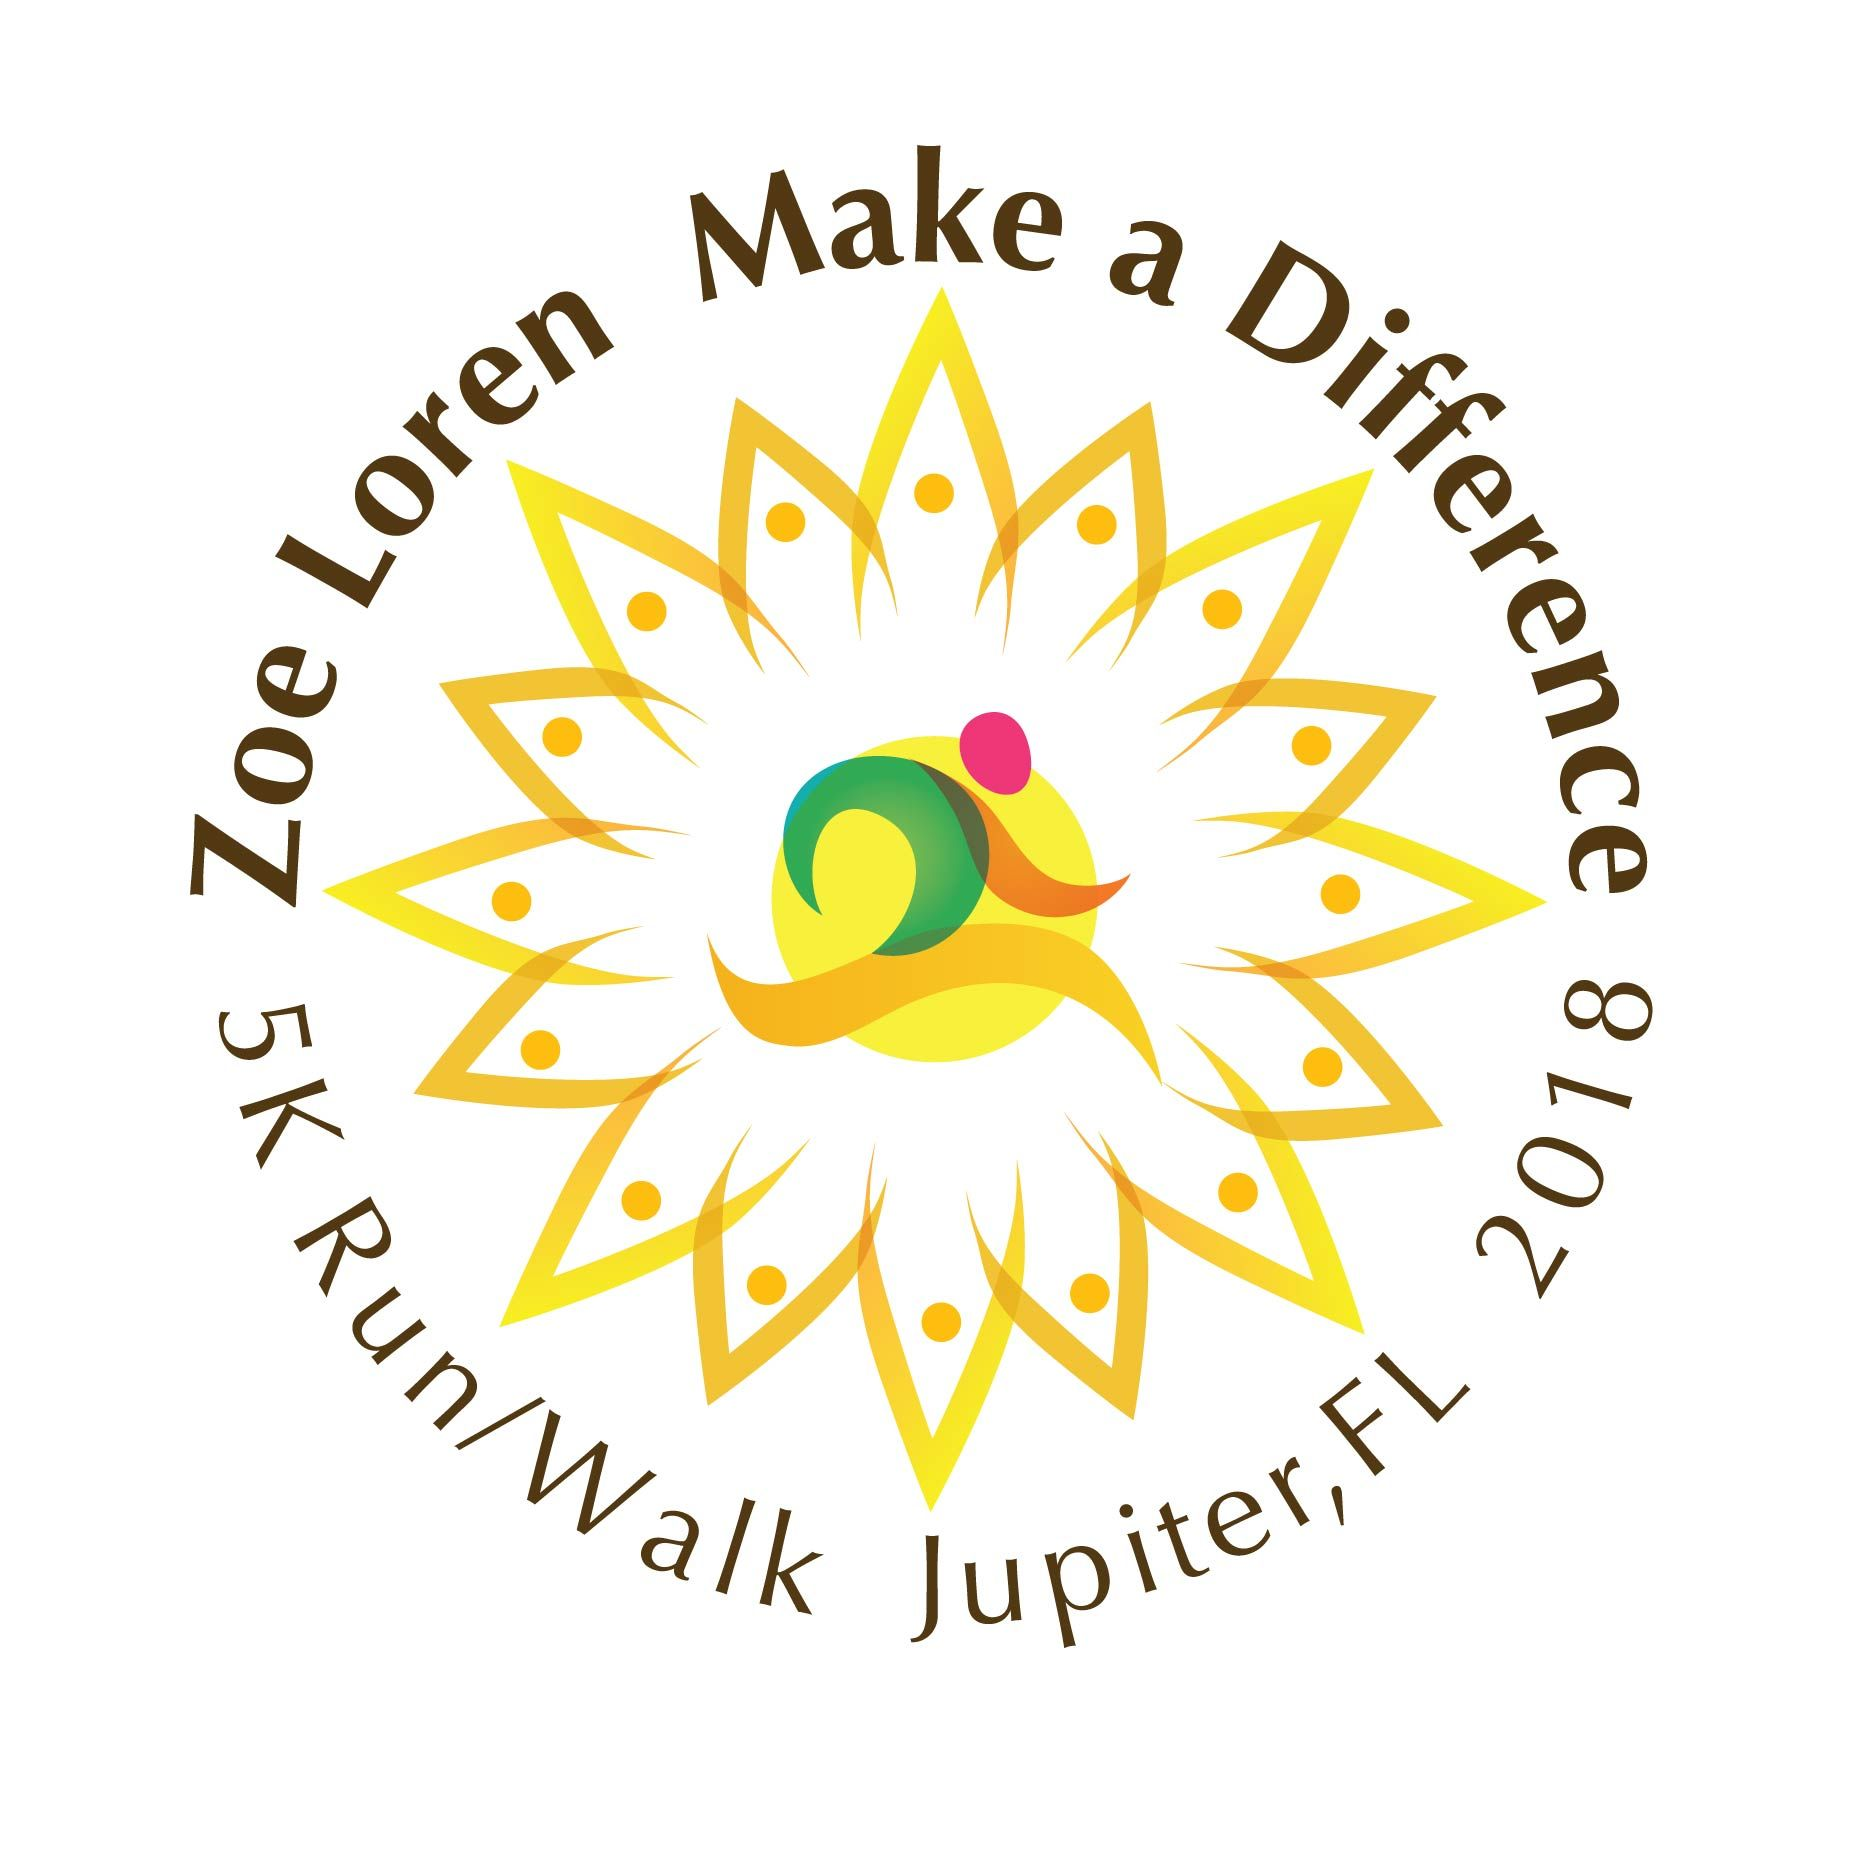 Jupiter Fl Donation Pickup Service: Save The Date! 8th Annual Zoe Loren Foundation 5K Run/Walk